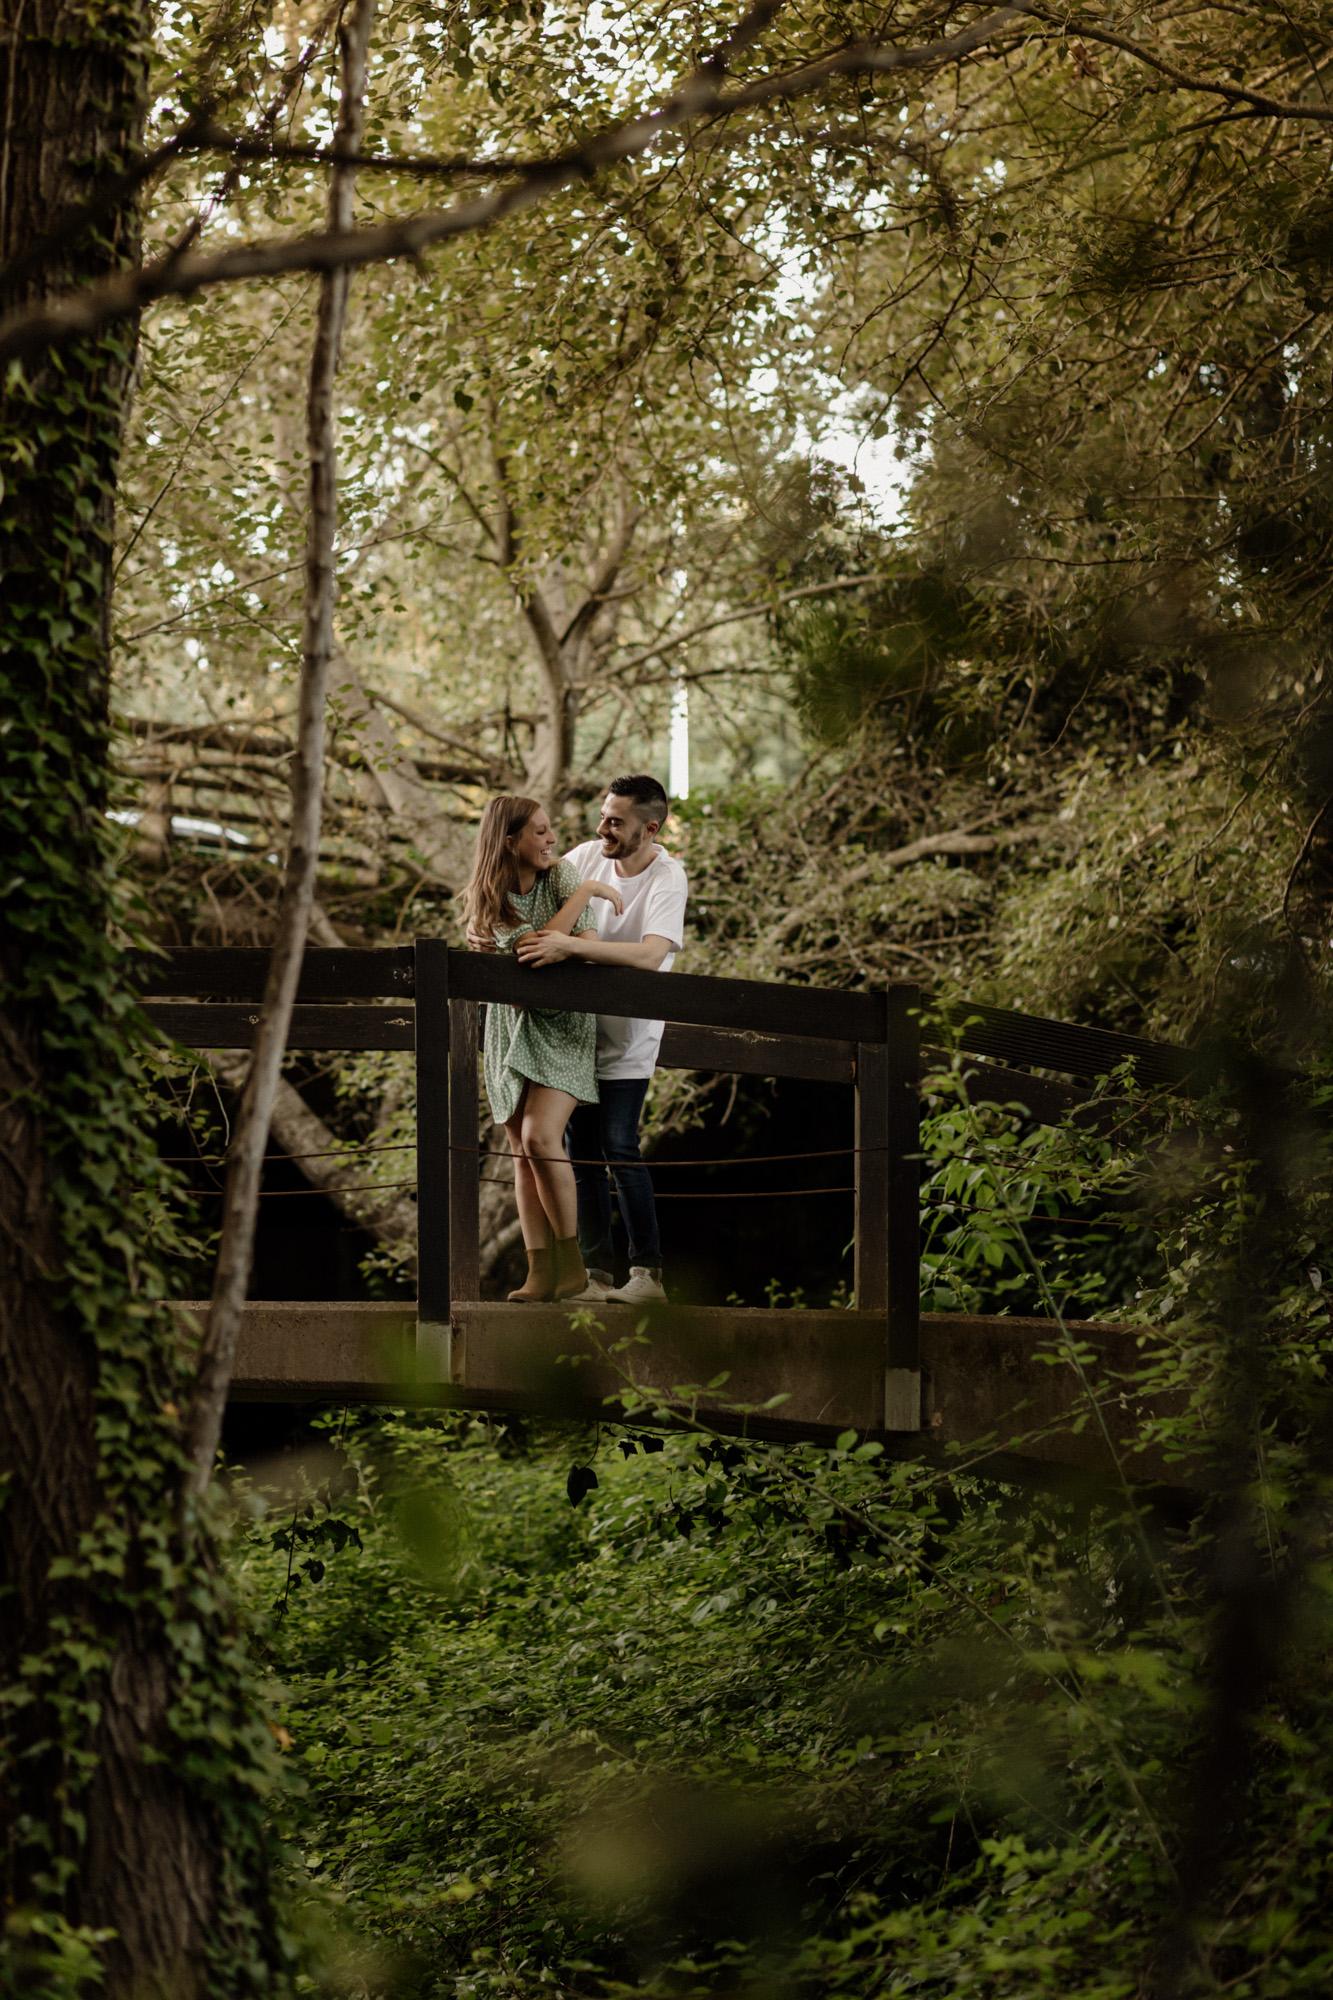 Lima-de-miguel-fotografo-boda-pareja-barcelona-4